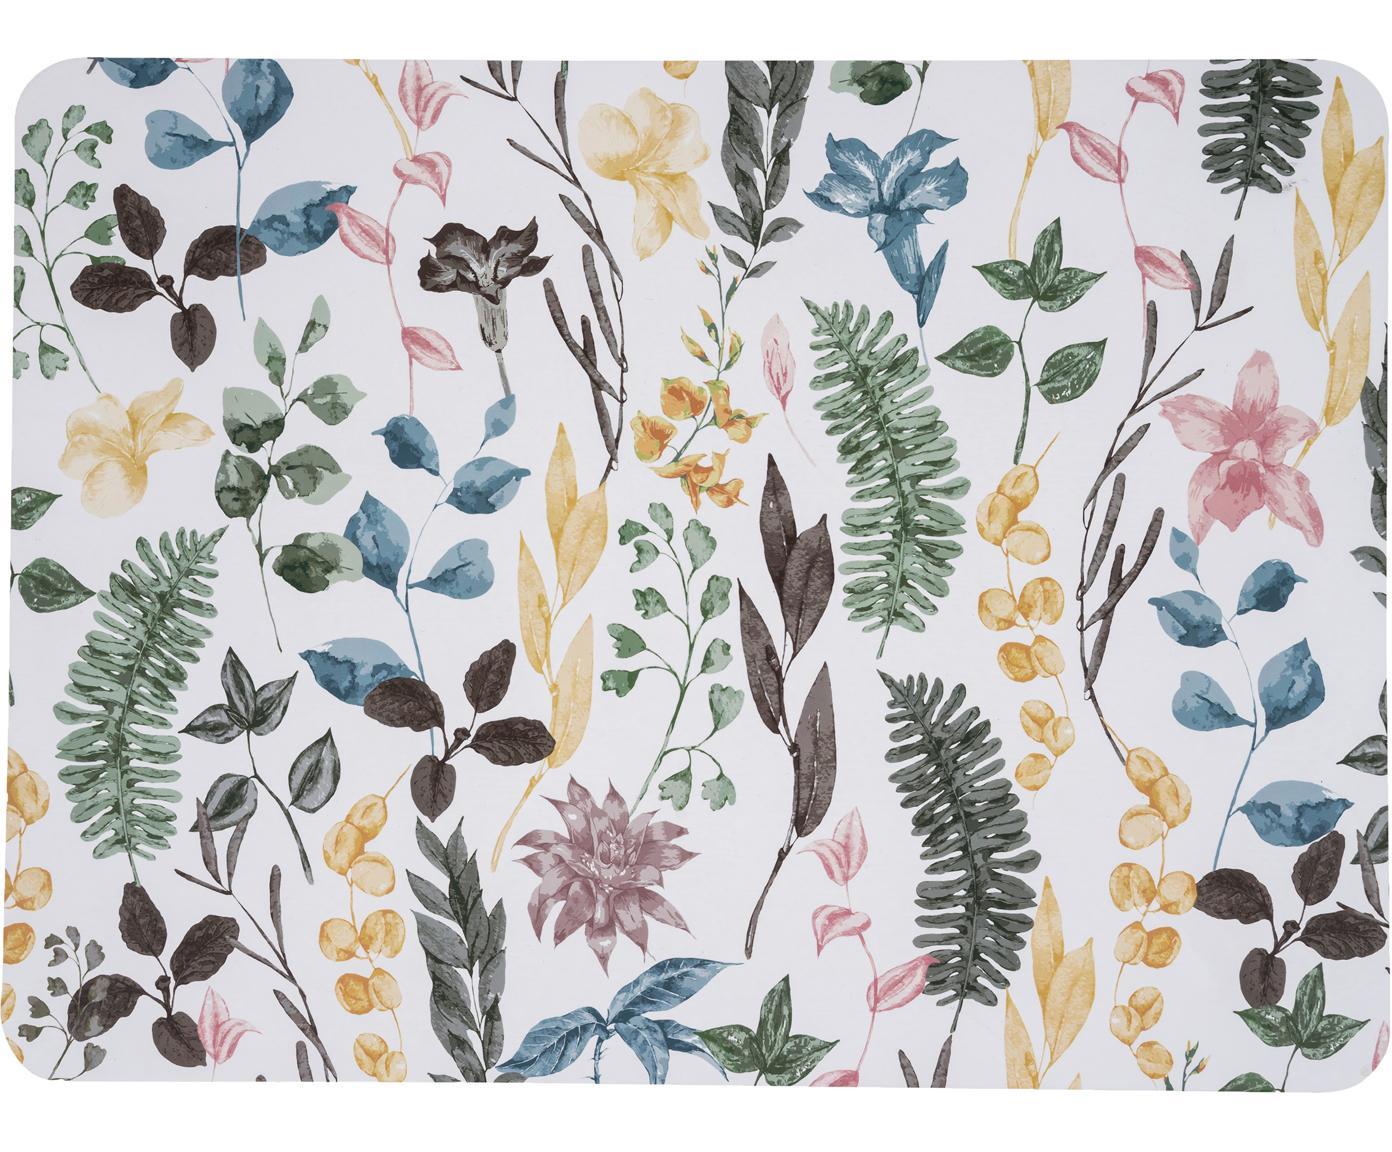 Placemats Summerfield, 2 stuks, MDF, kurk, Wit, multicolour, B 40 x D 30 cm